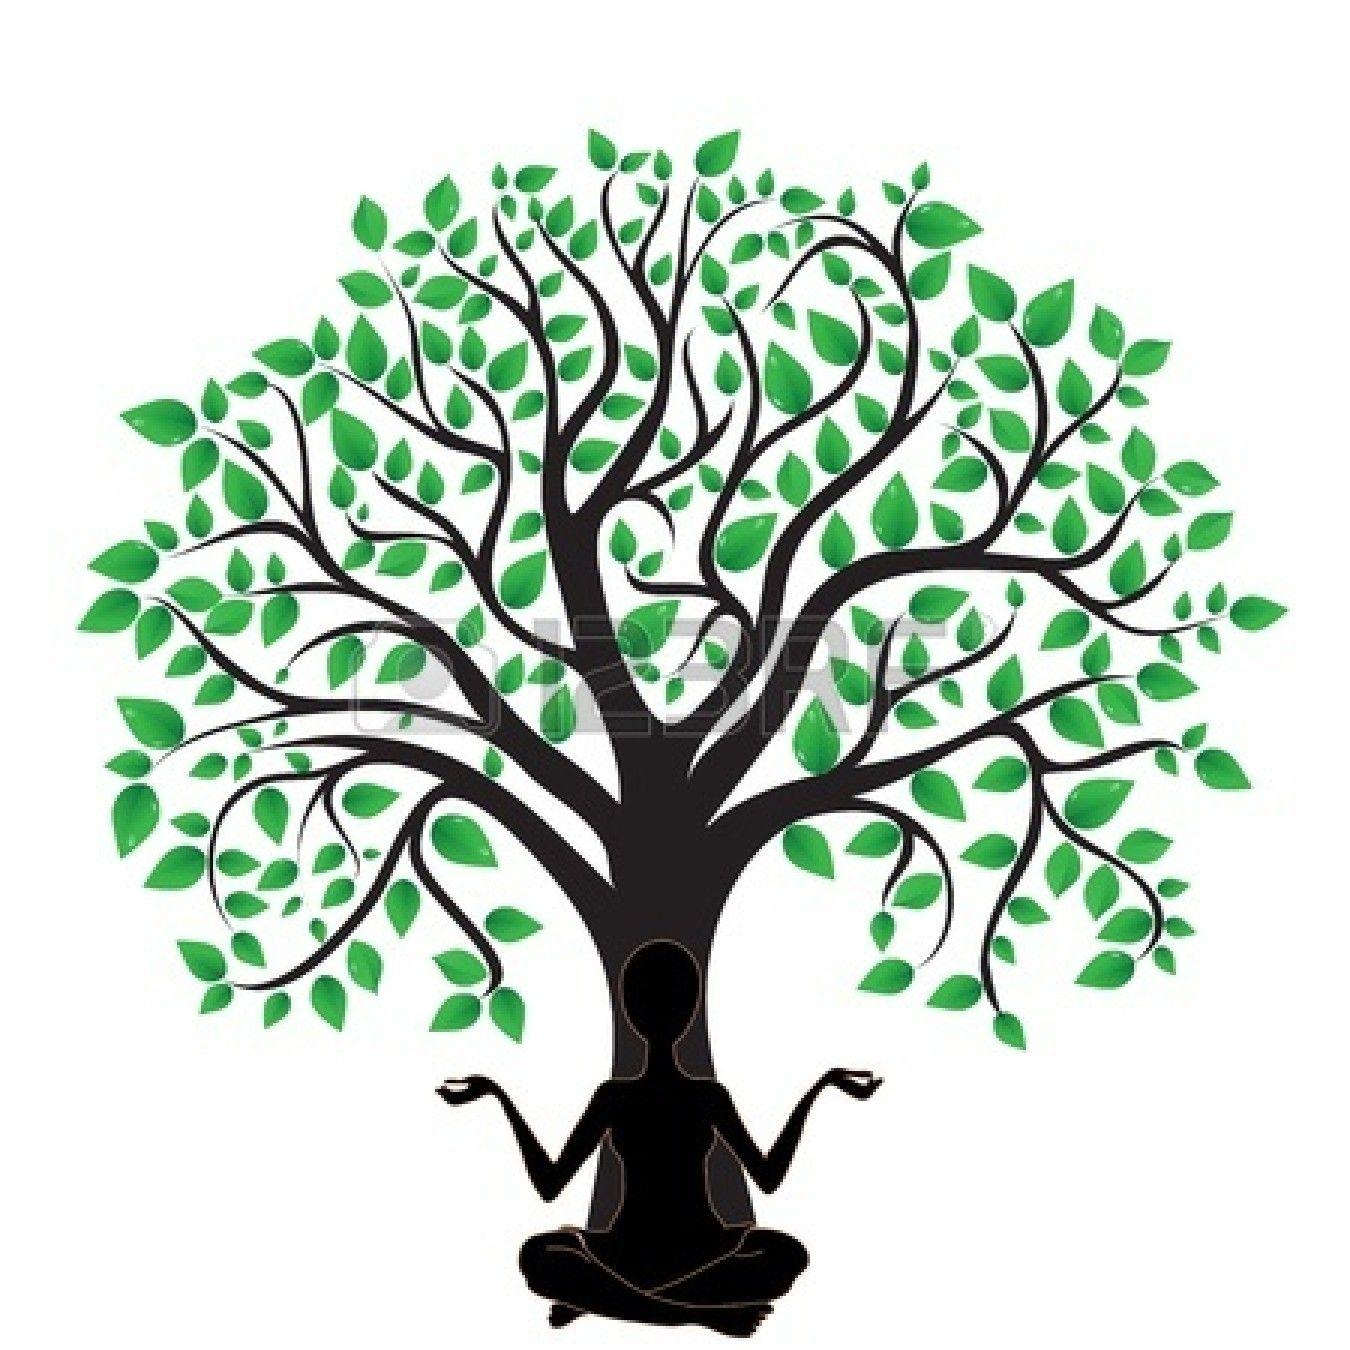 1350x1350 Oak Tree Silhouette Logo Clipart Panda Free Clipart Images Trees